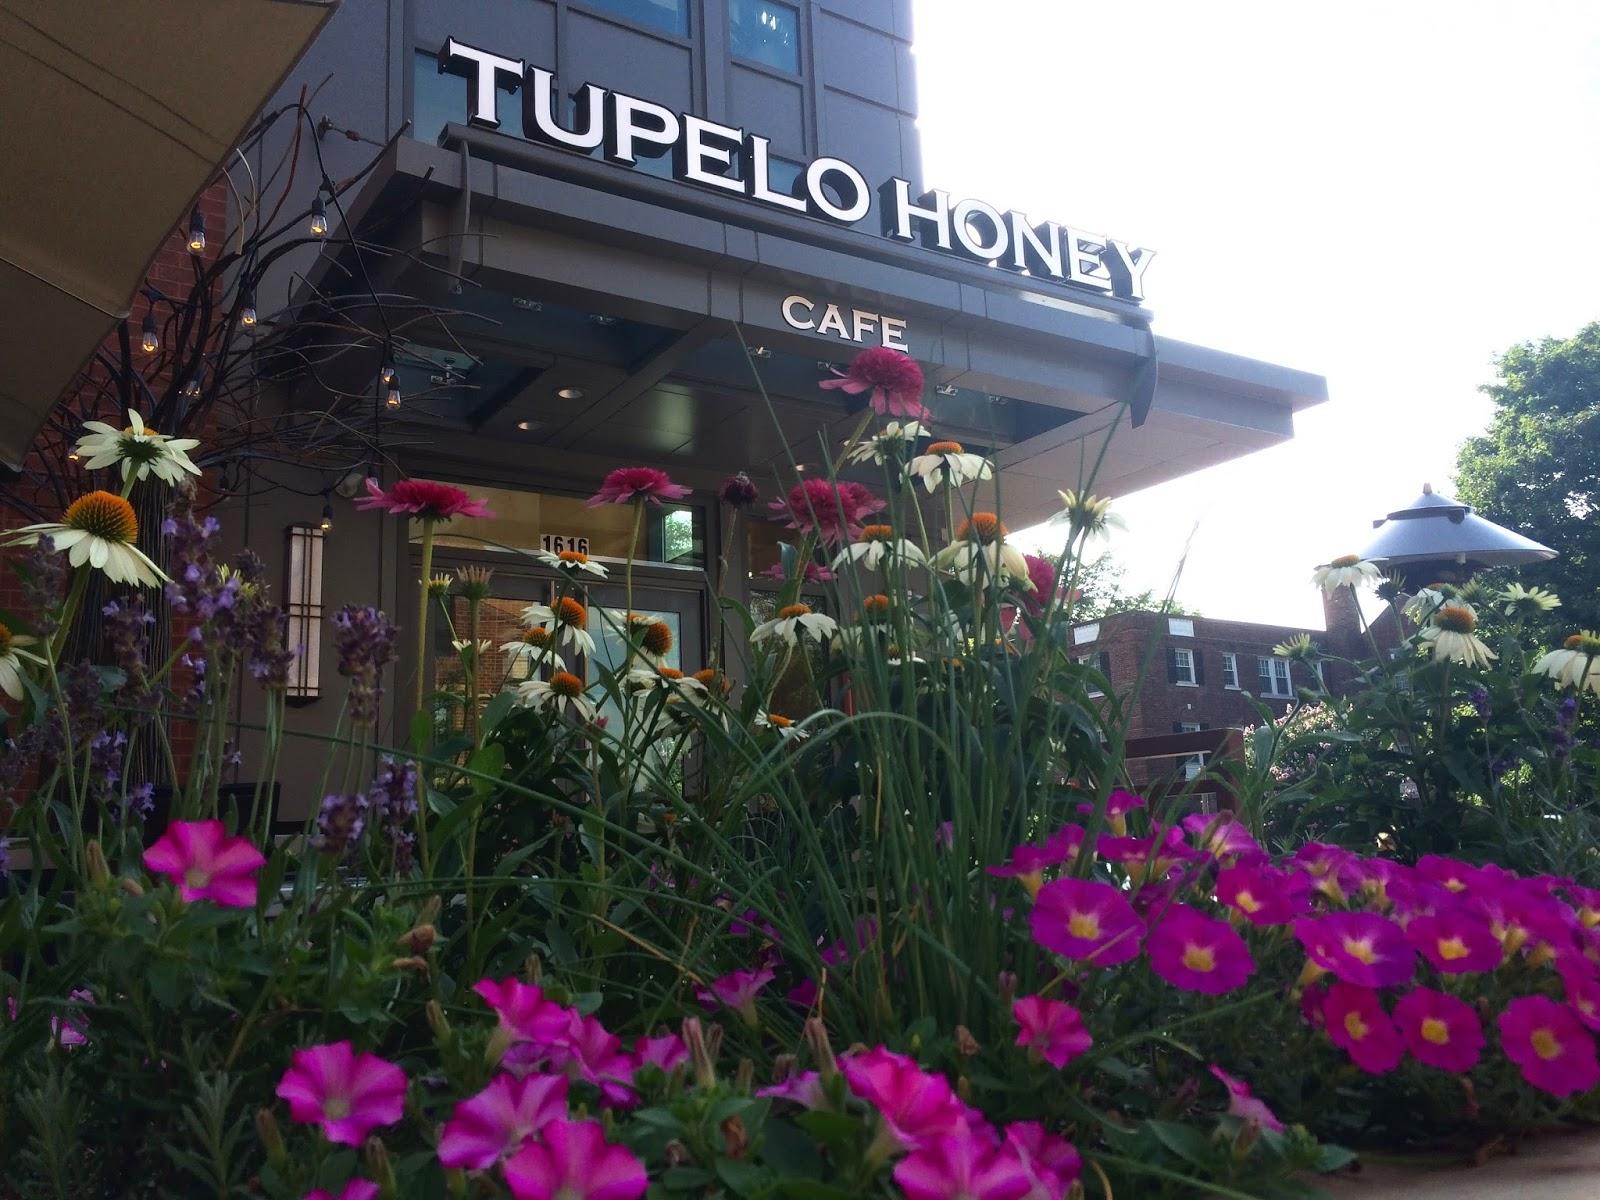 Restaurant: Tupelo Honey Cafe (Arlington, VA)